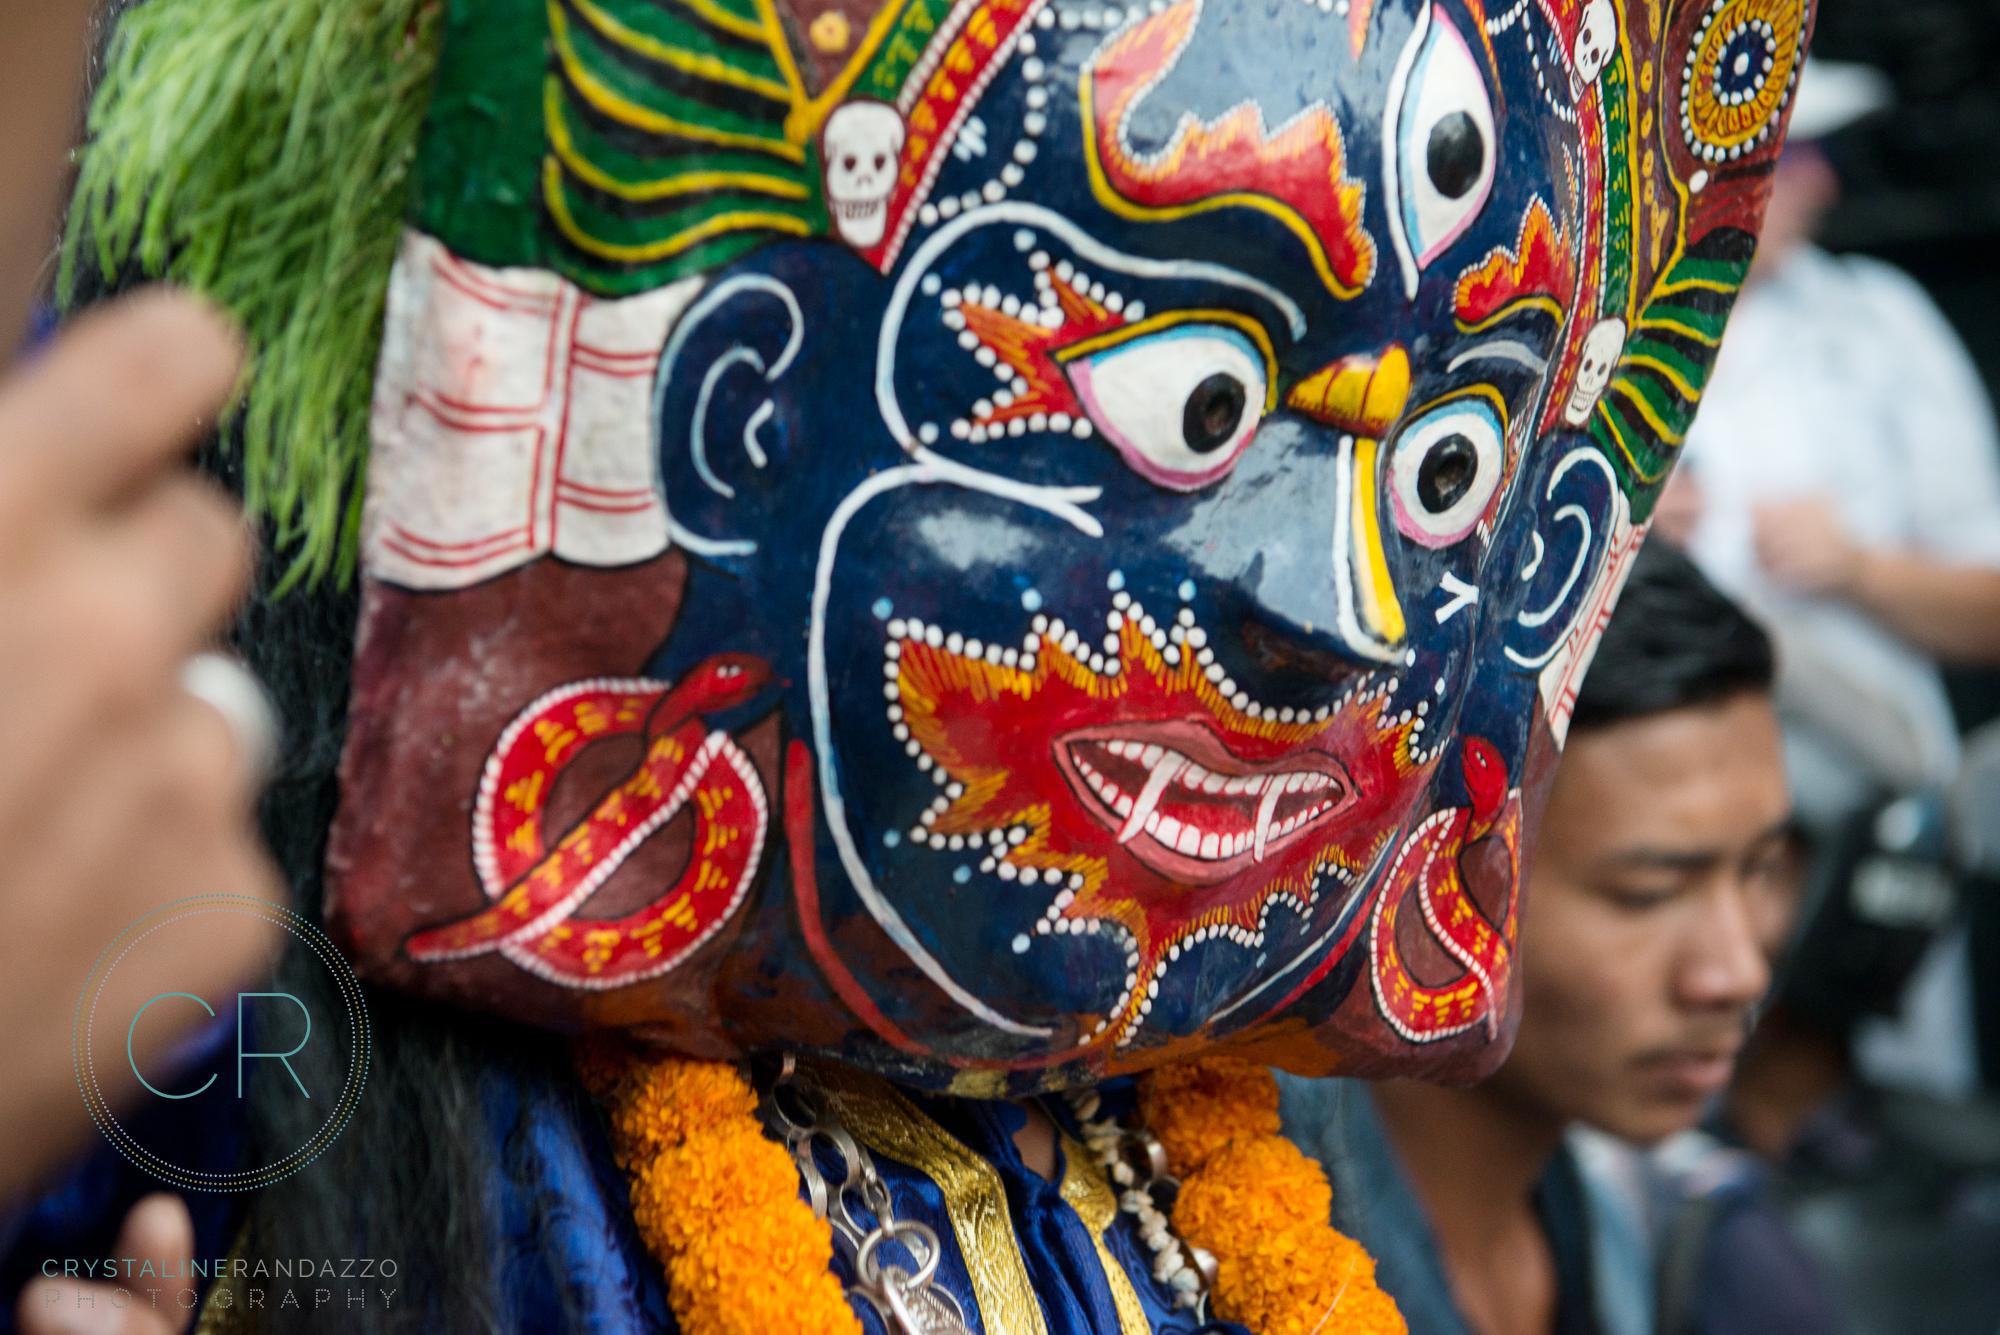 Randazzo_Kathmanduwanderings_20170905_00204.jpg